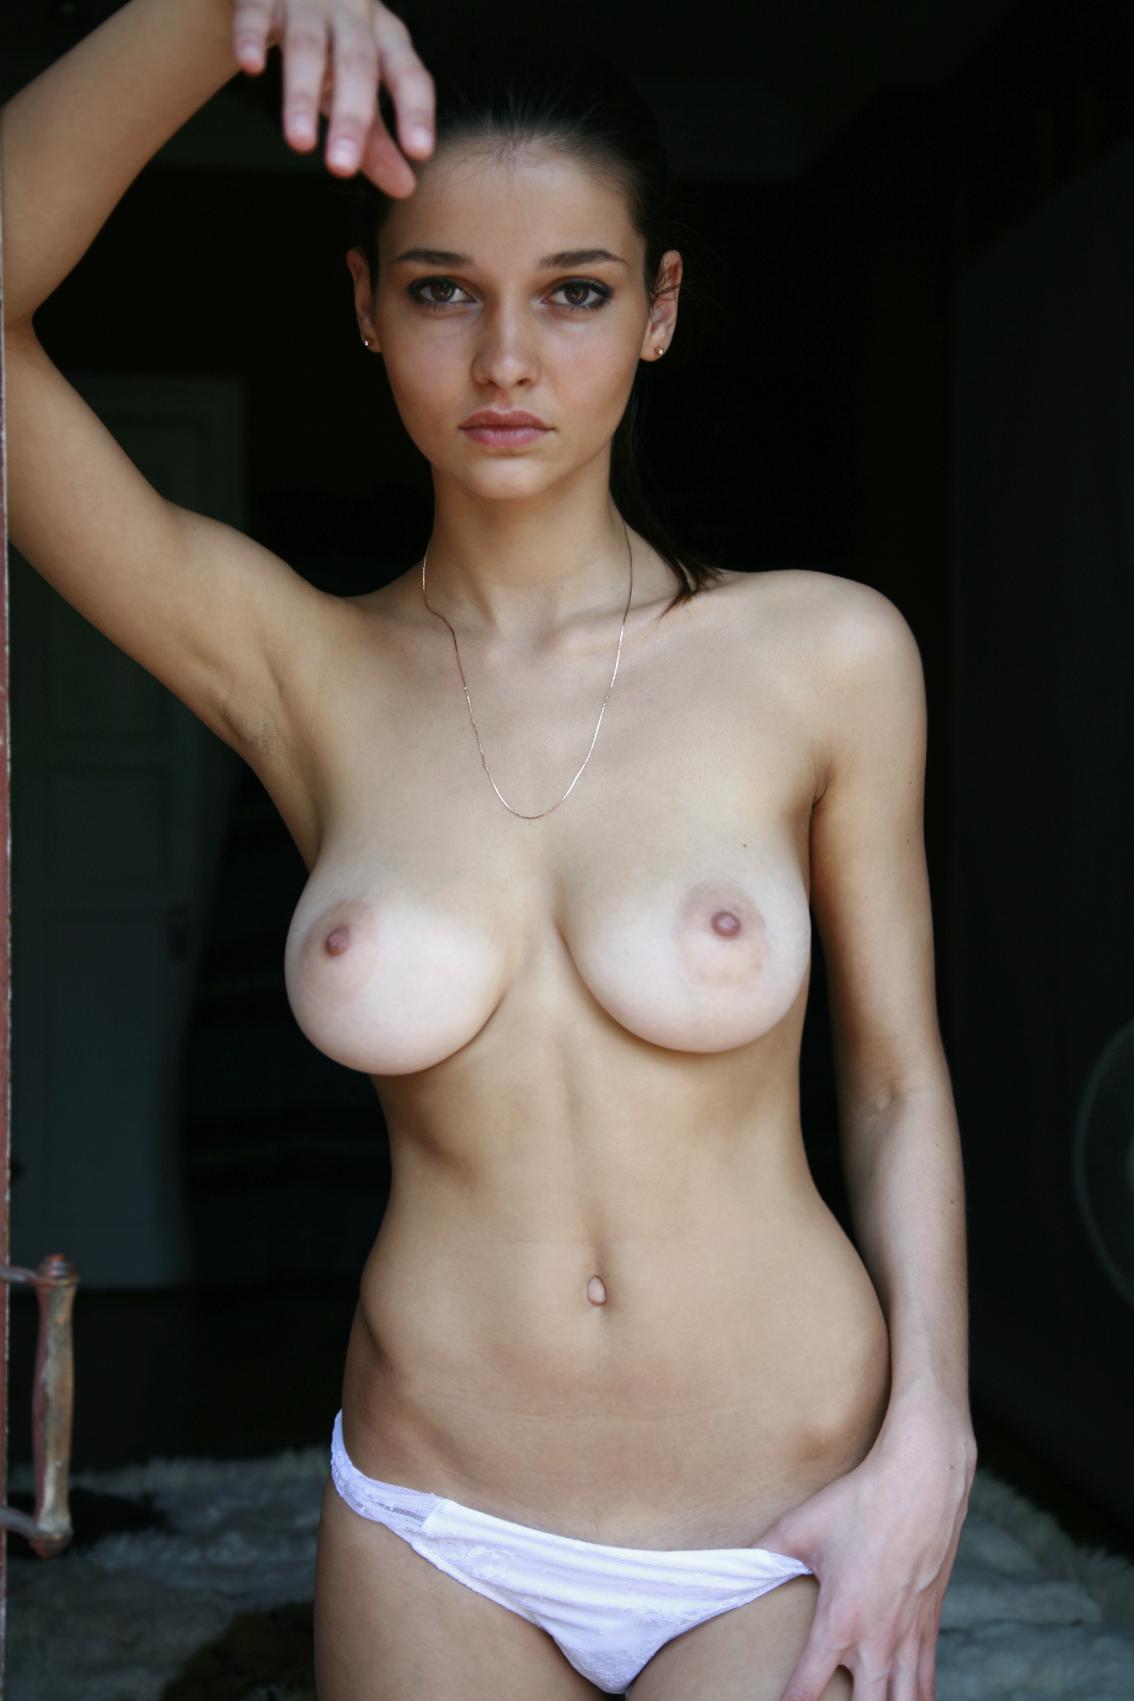 diana-skinny-nude-mike-dowson-08